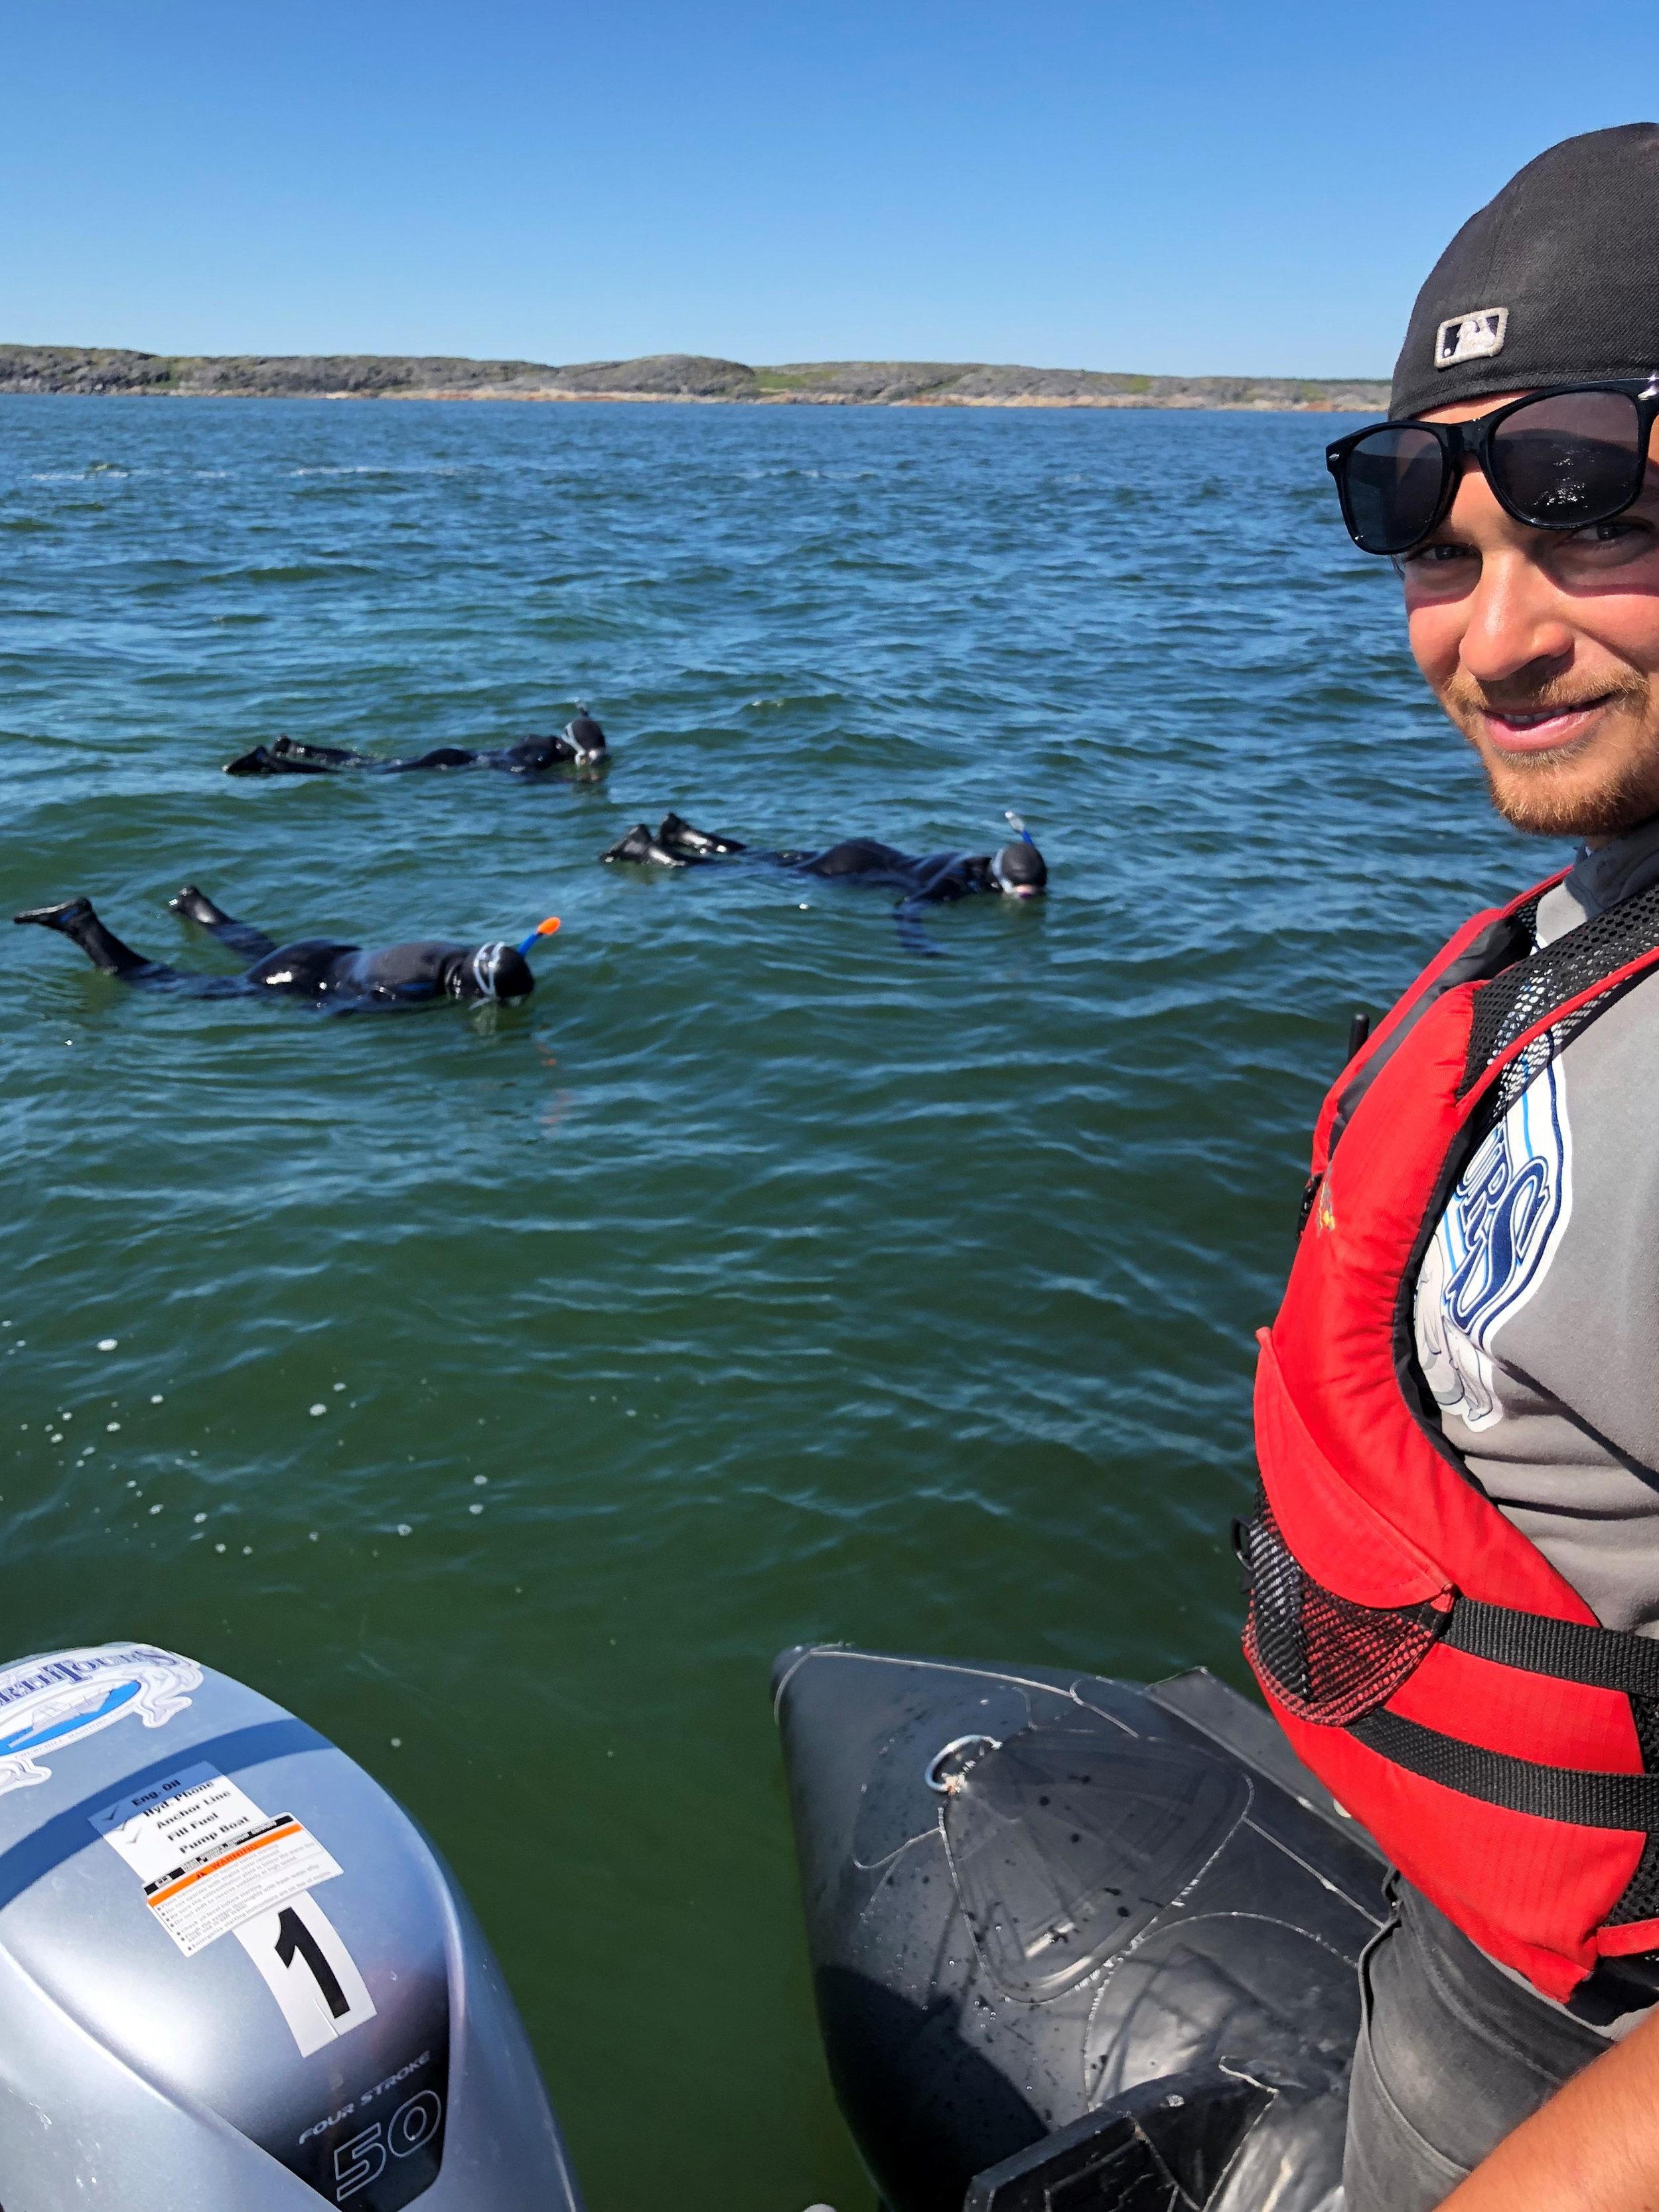 teri_arctic_snorkeling_whales_spiritedtable23.jpg